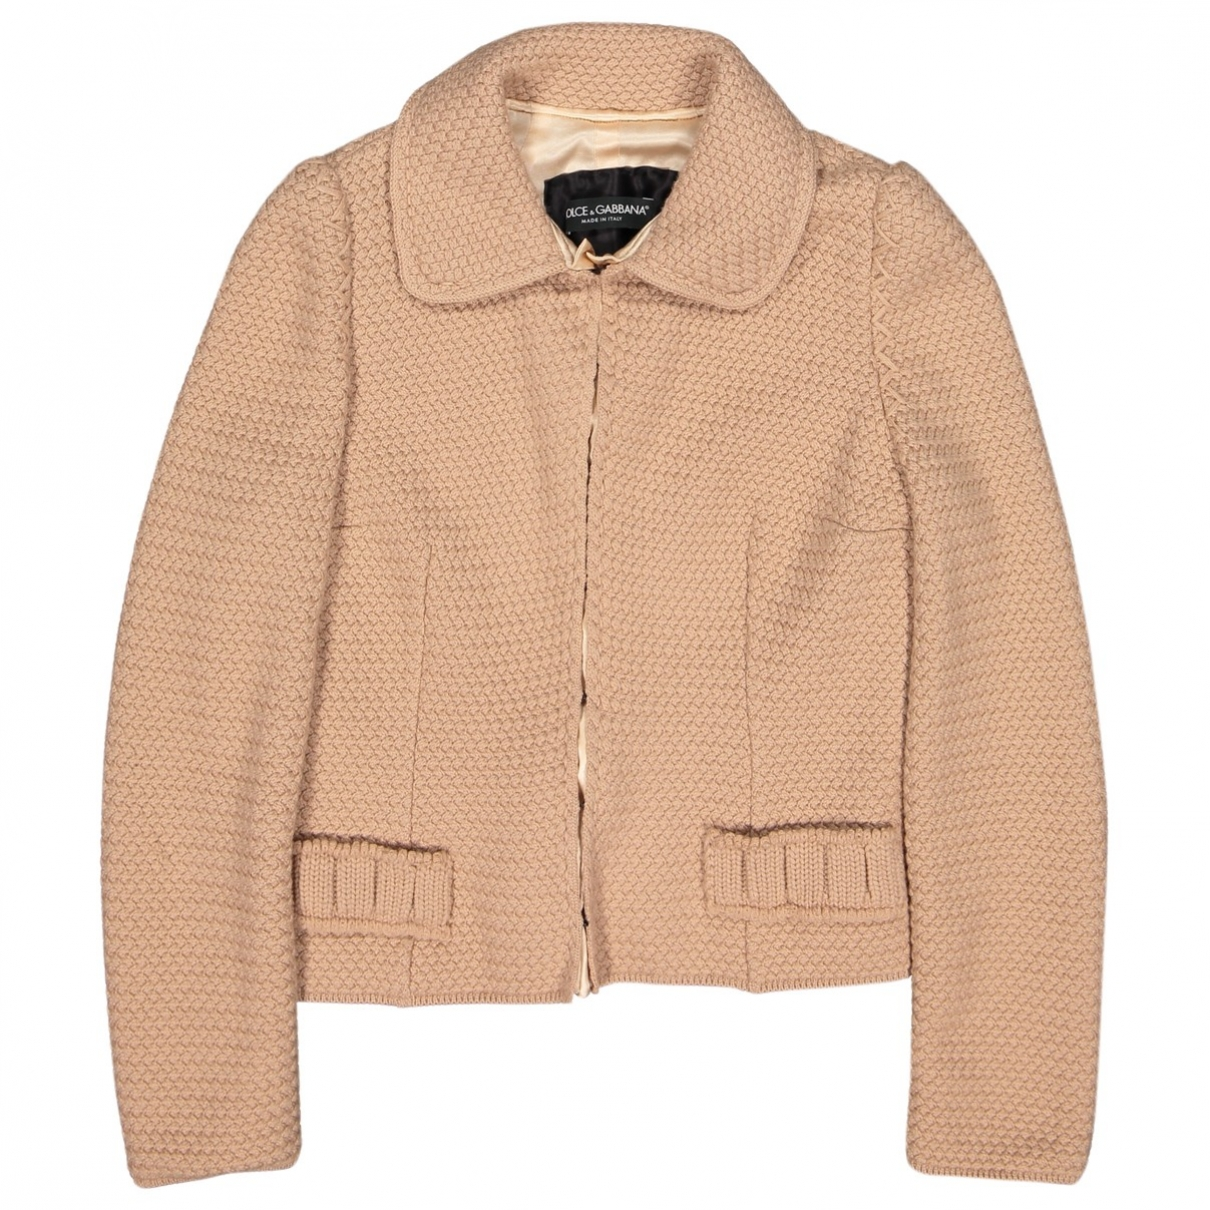 Dolce & Gabbana \N Pullover in  Beige Wolle